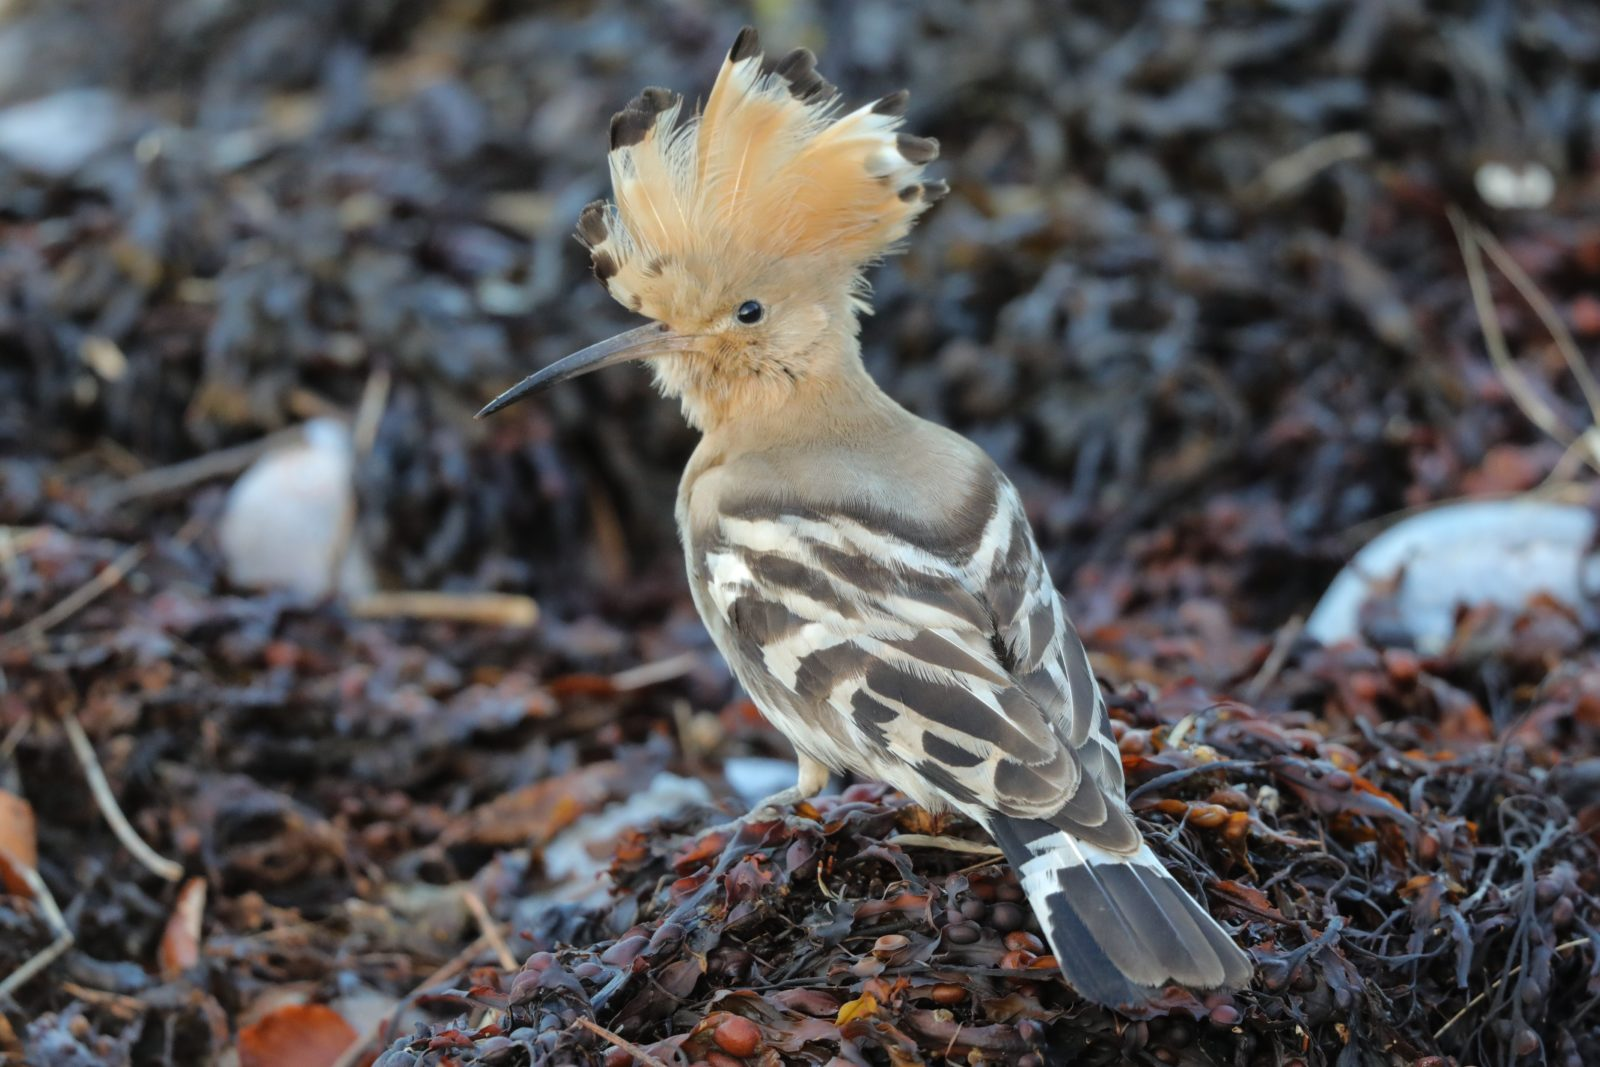 What's the rarest bird we've seen at Montrose Basin?